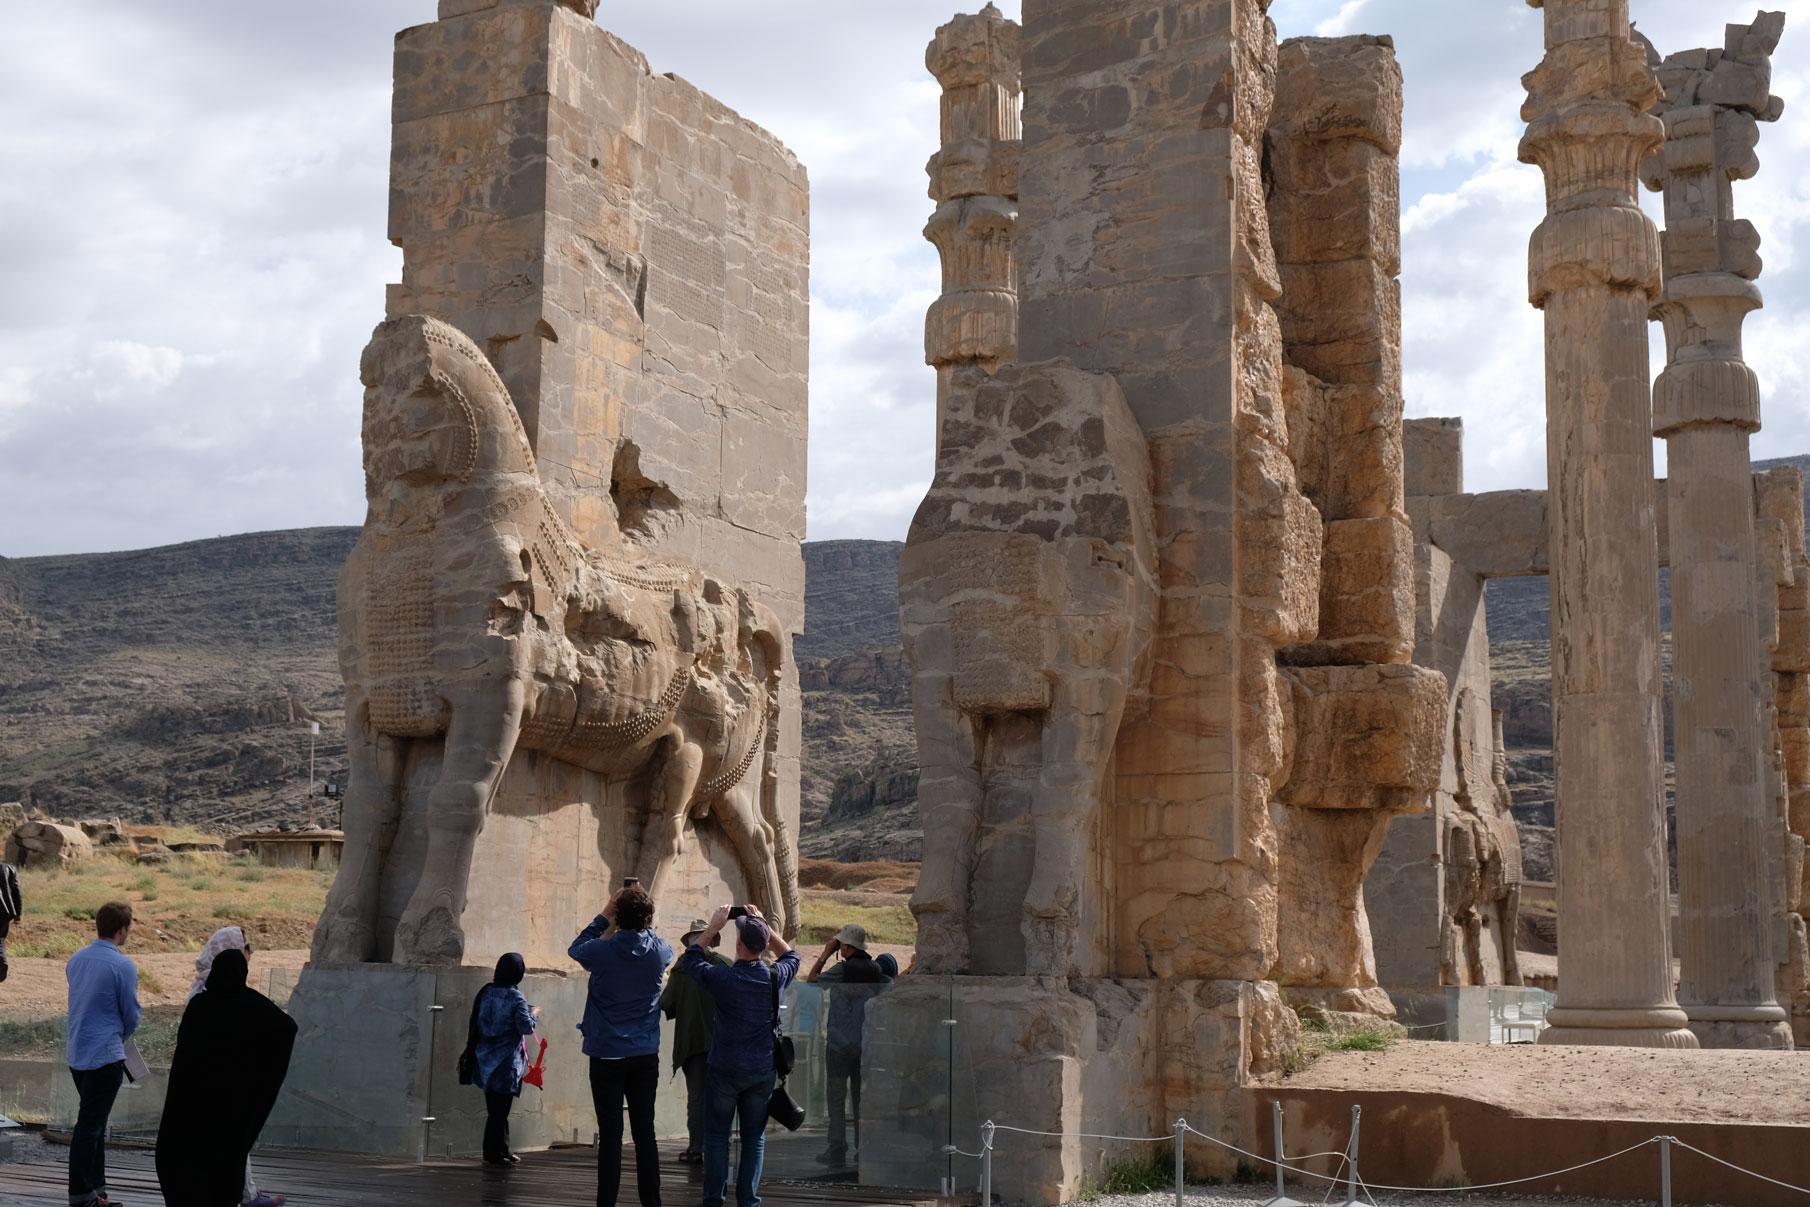 Eingangstor von Persepolis